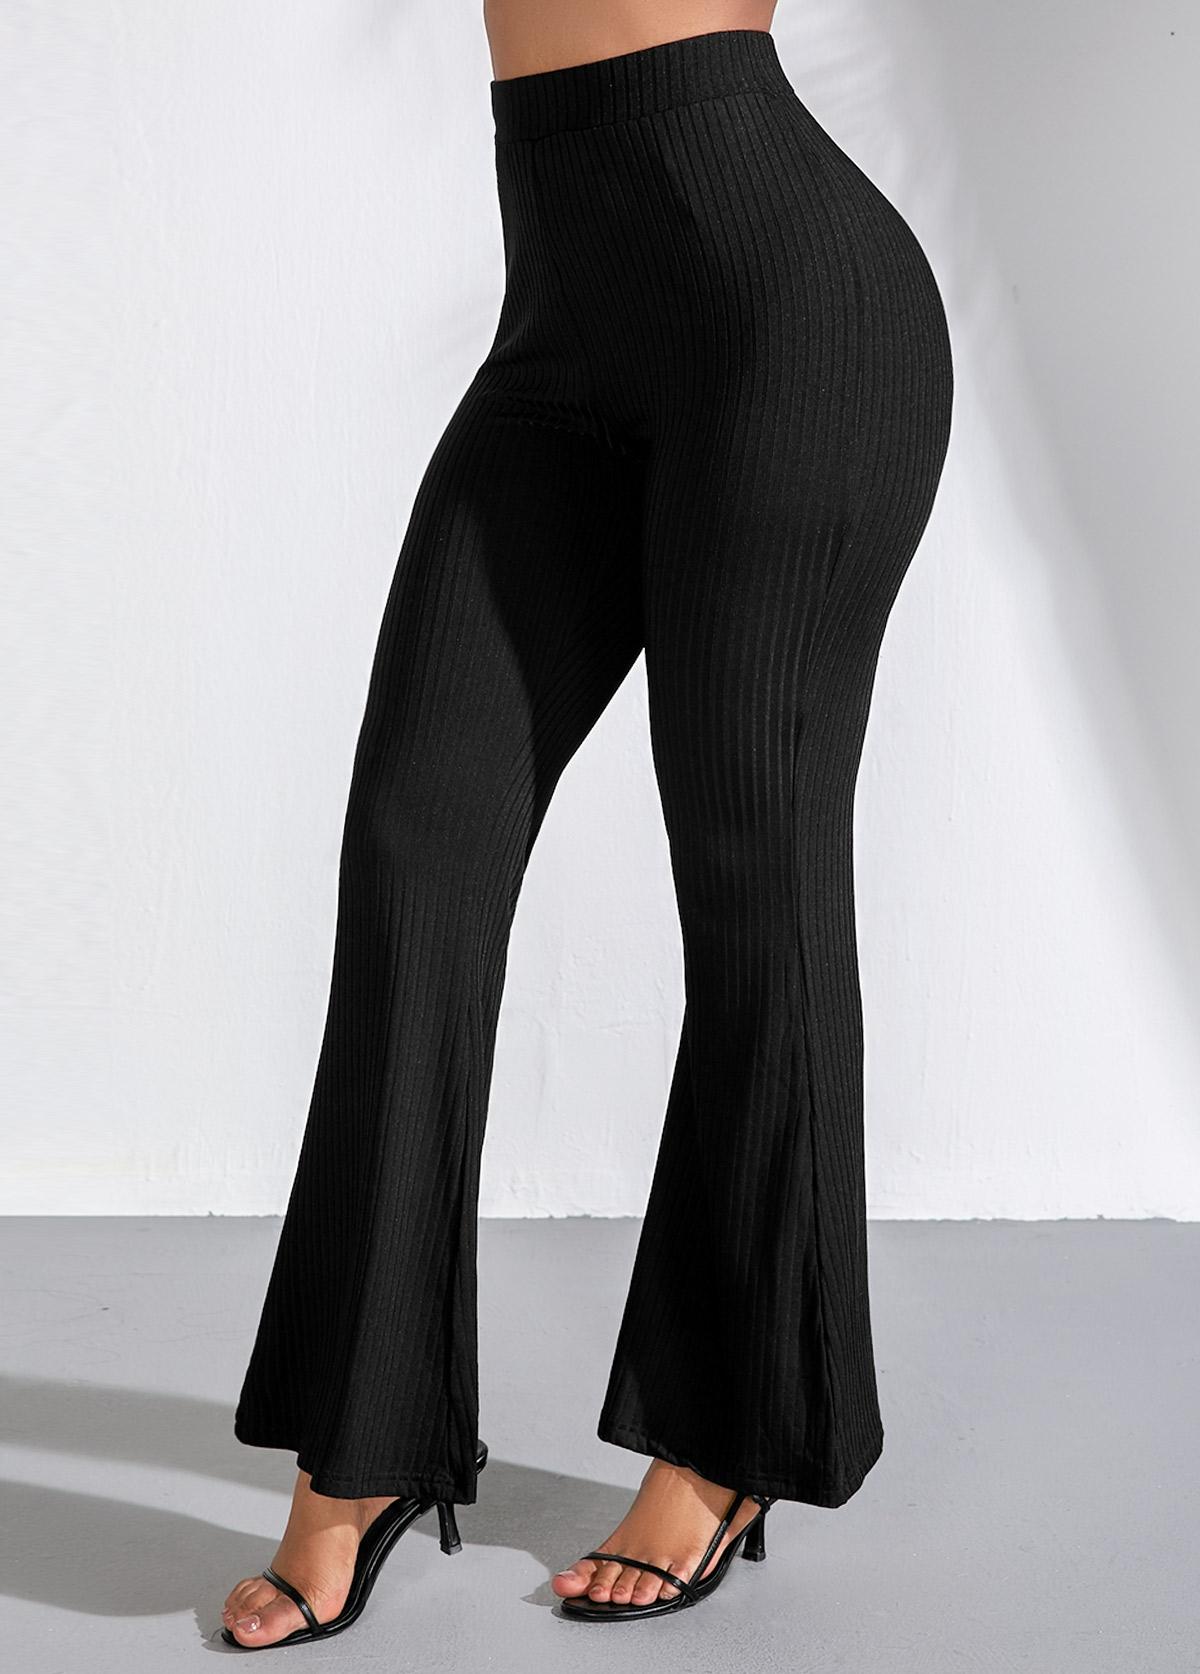 High Waist Black Elastic Flare Pants